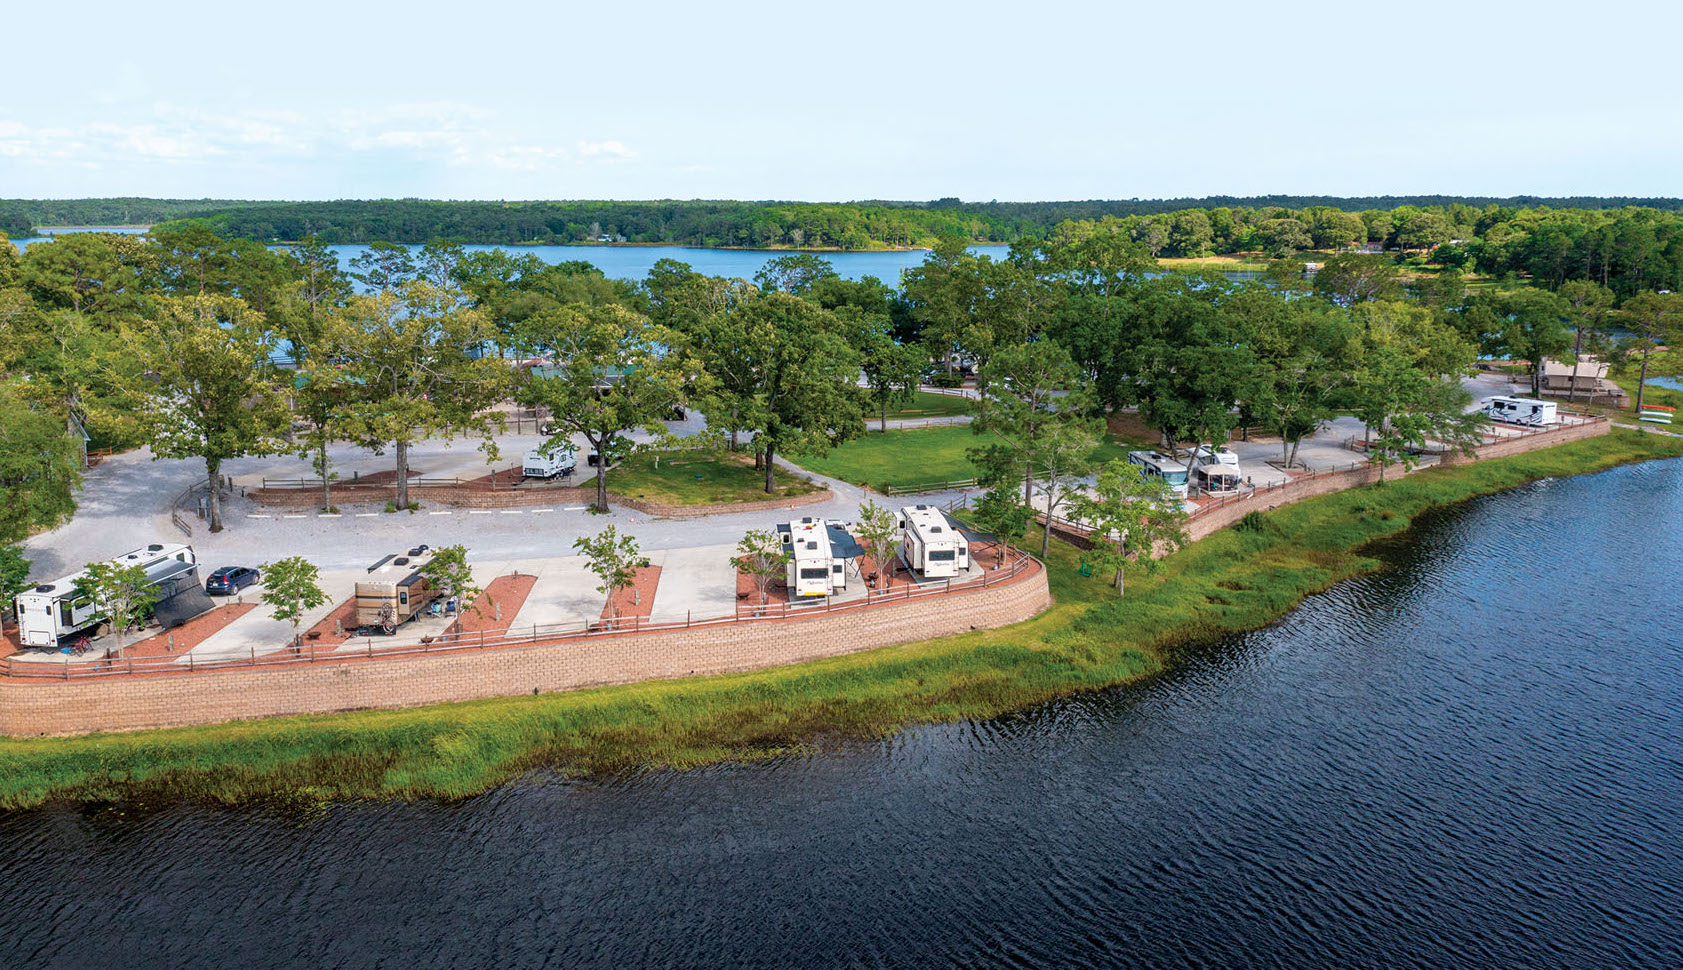 Twin Lakes Camp & Resort